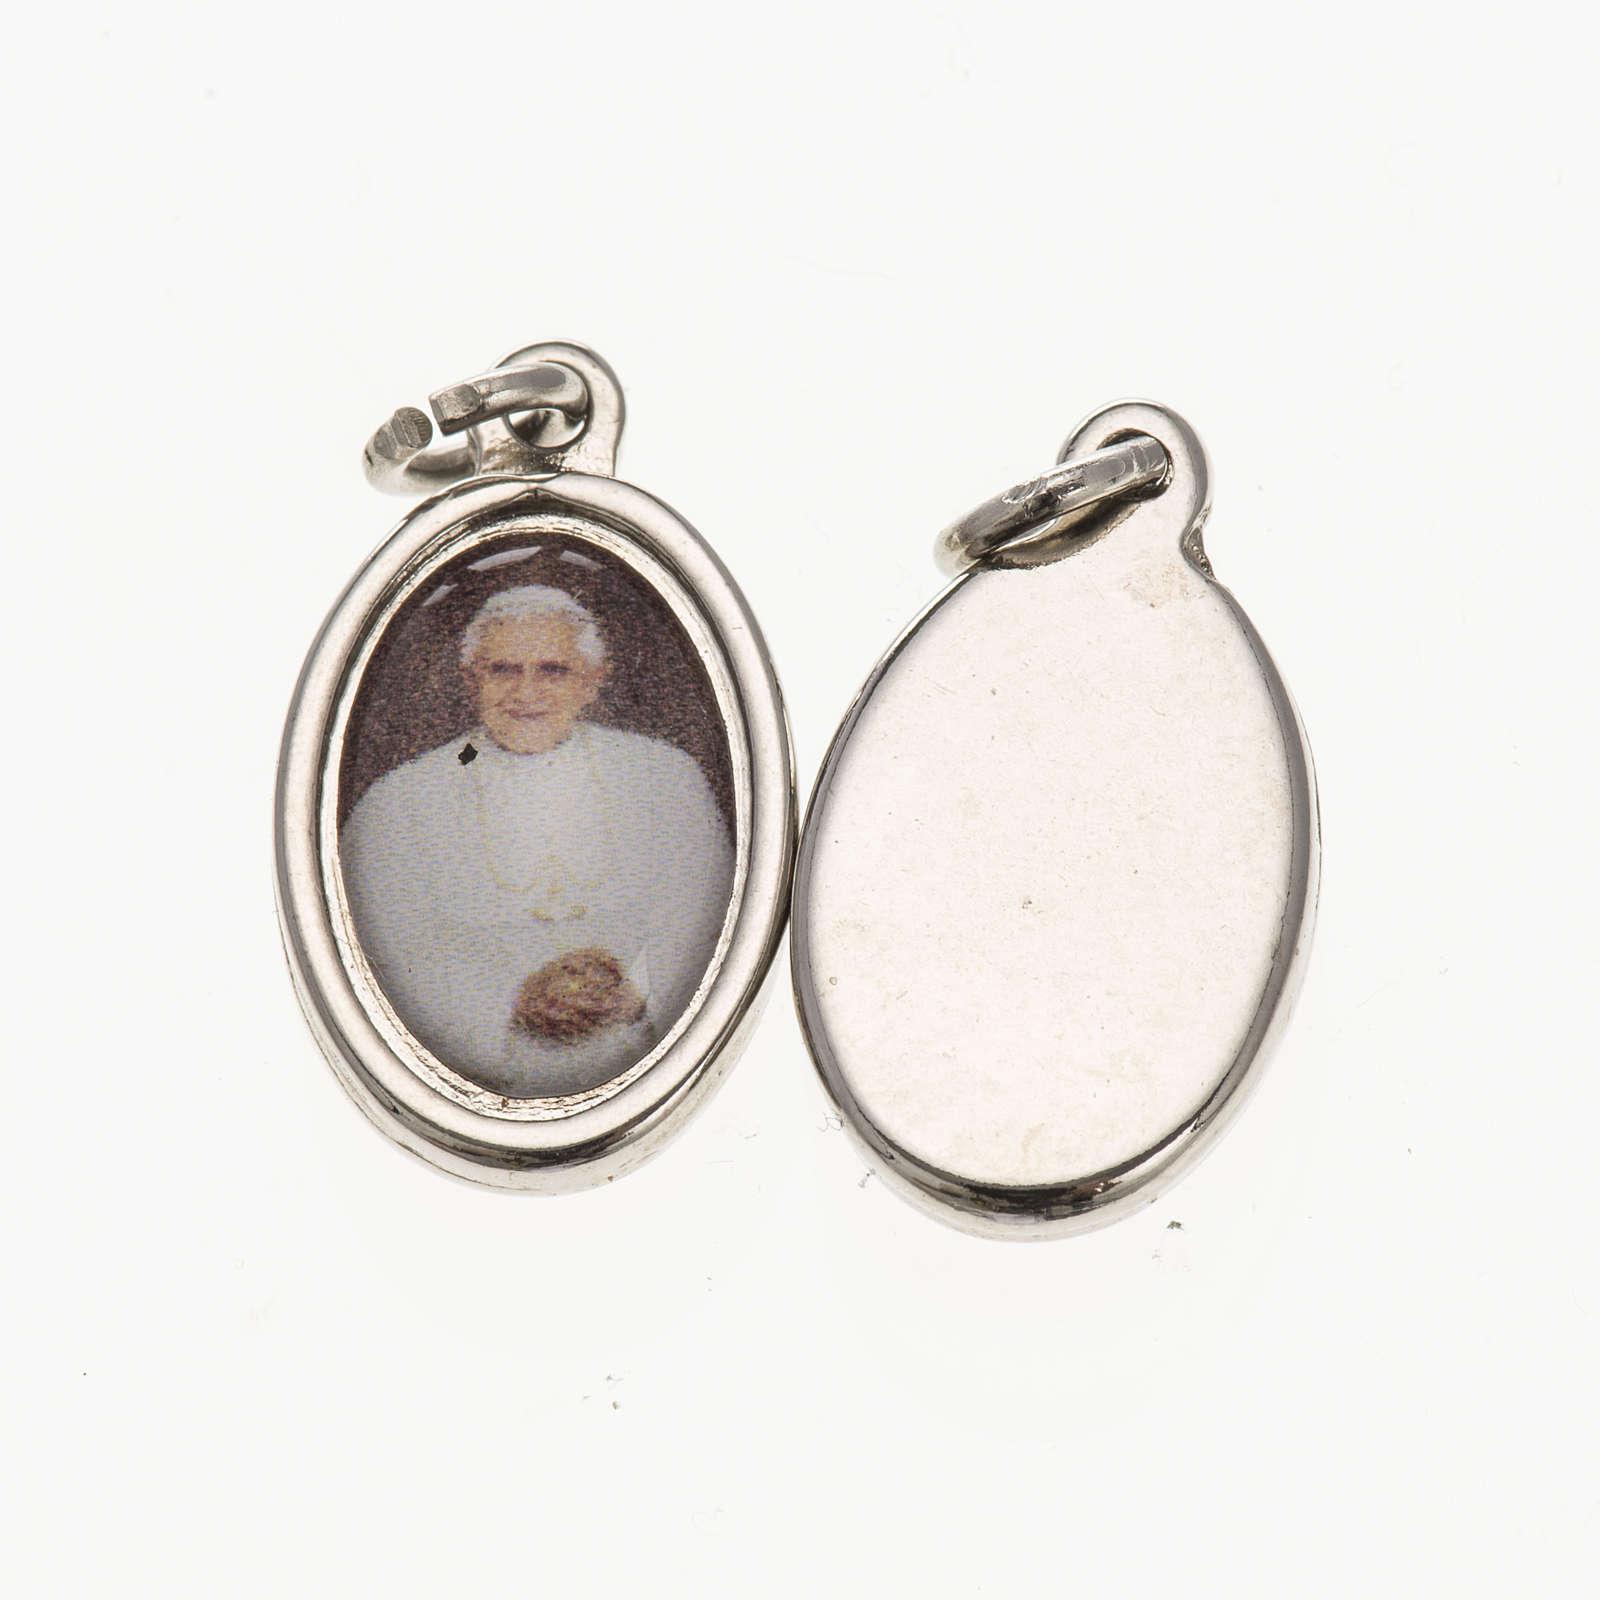 Medalla Benedicto XVI- metal plateado resina 1,5x1cm 4